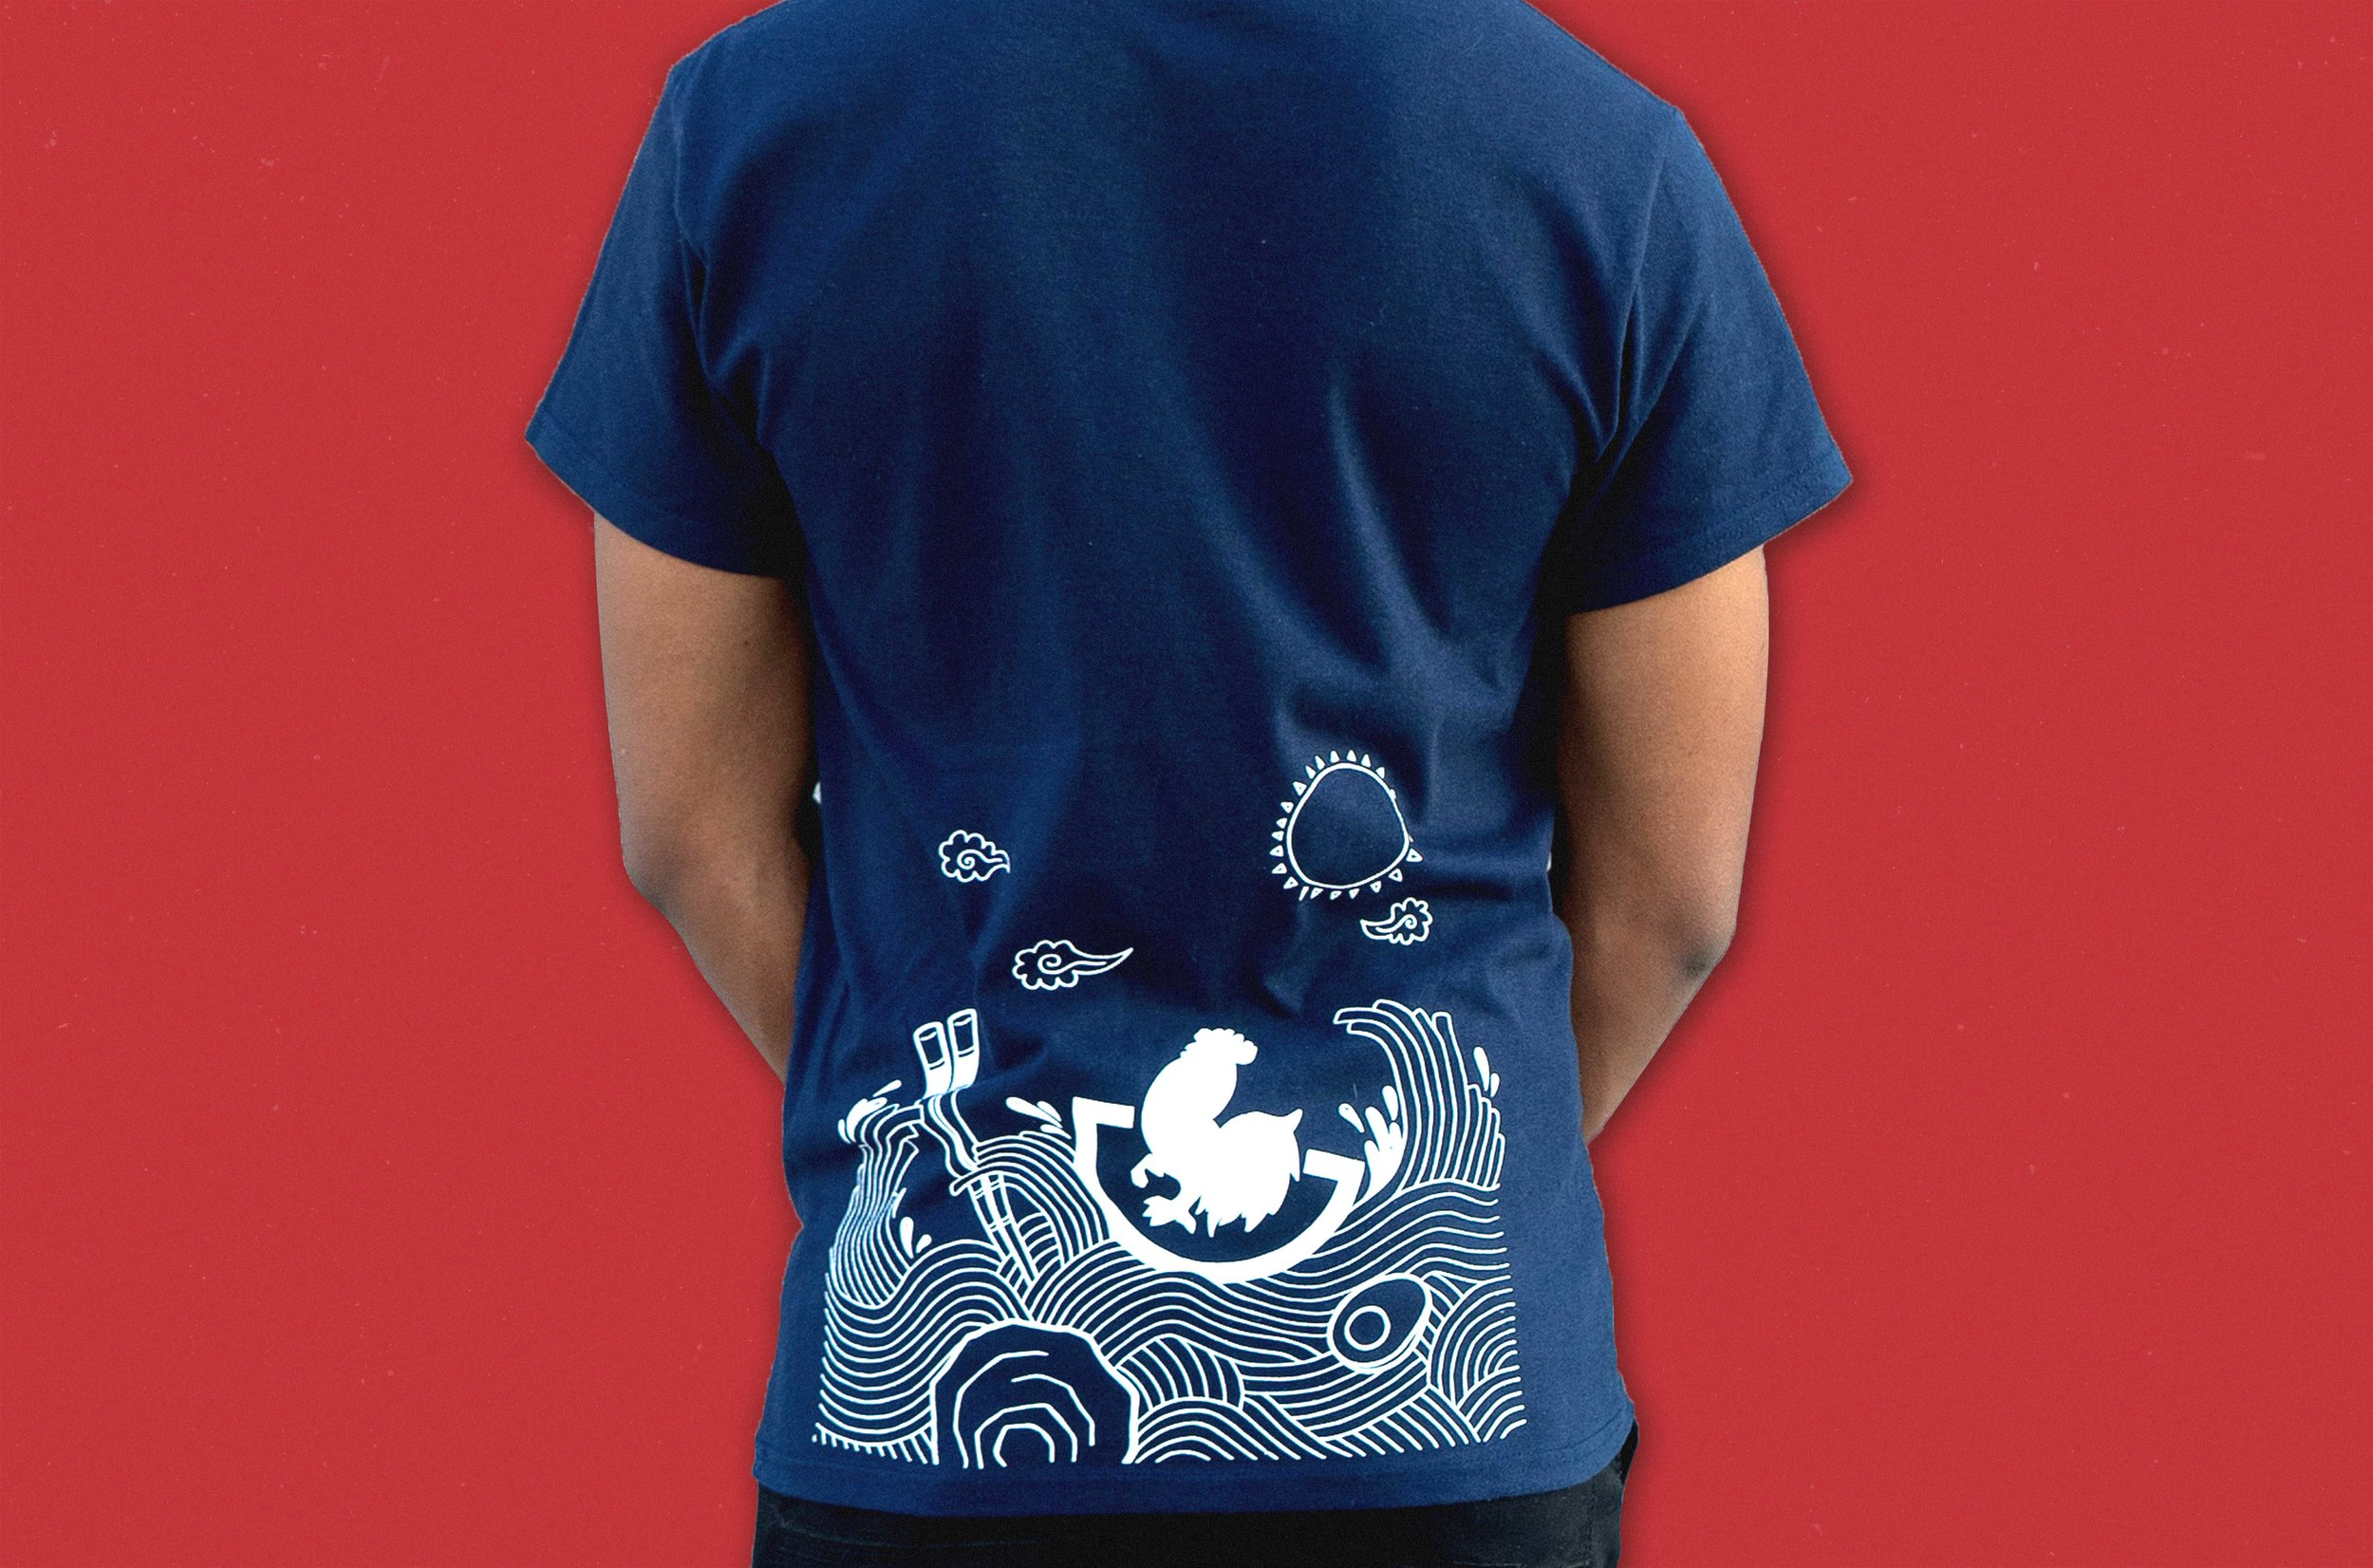 Shirt-back.jpg